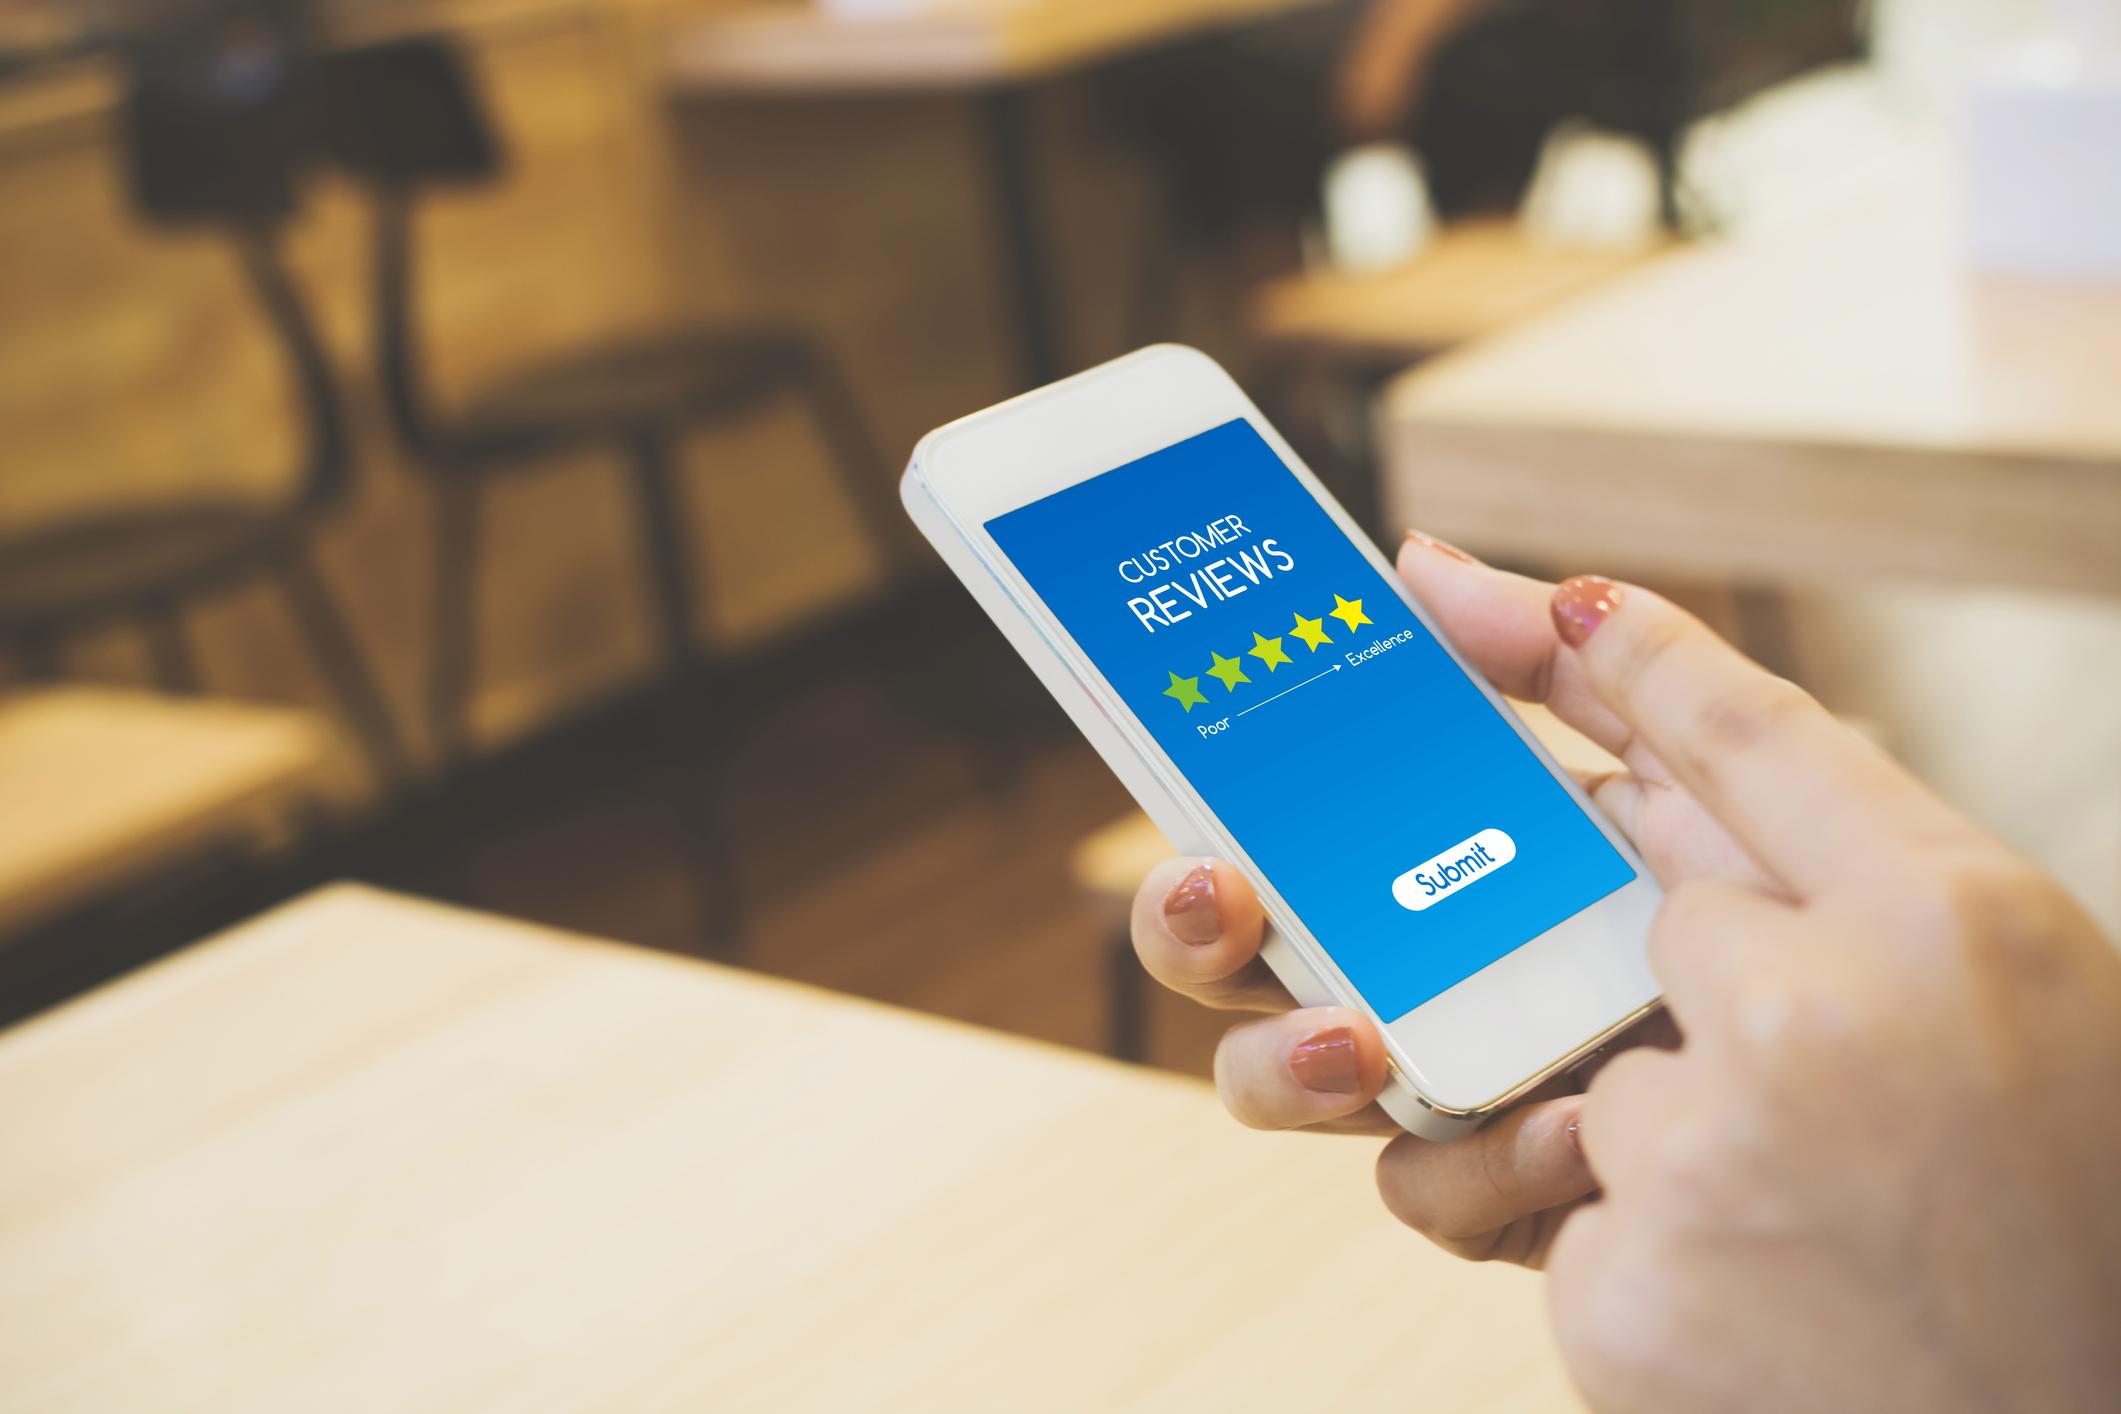 Mobile Phone Customer Review Screen